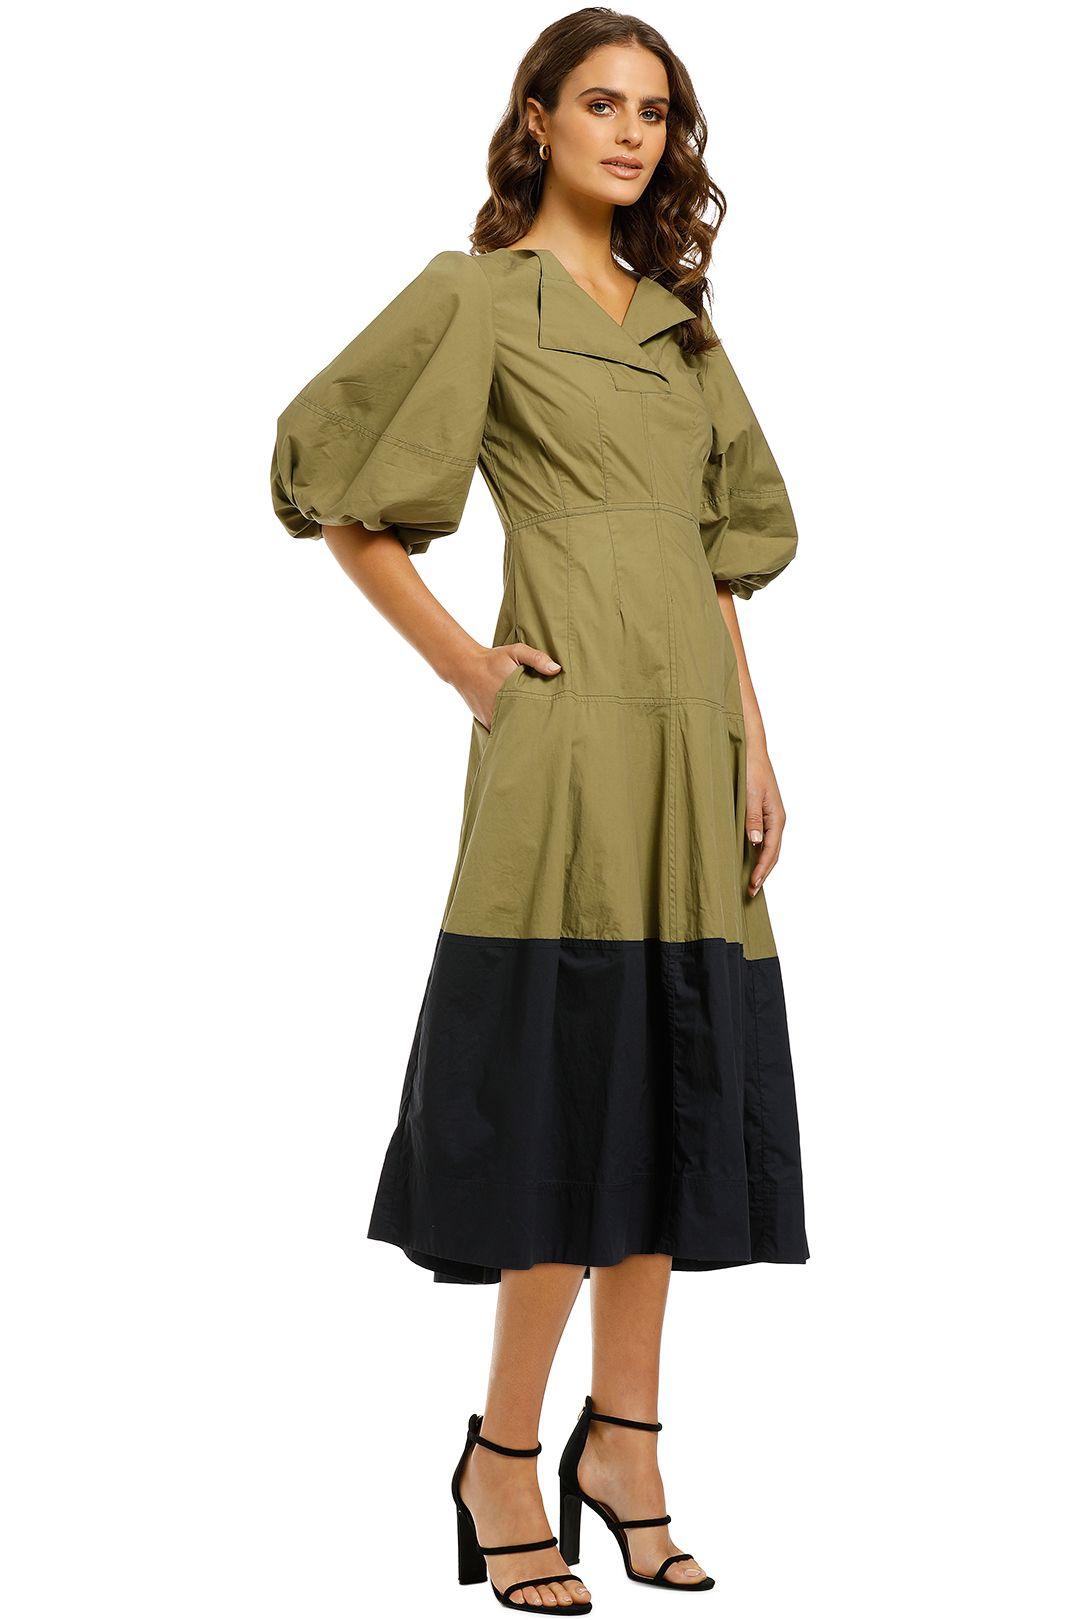 Lee-Mathews-Elsie-Balloon-Sleeve-Dress-Khaki-Side